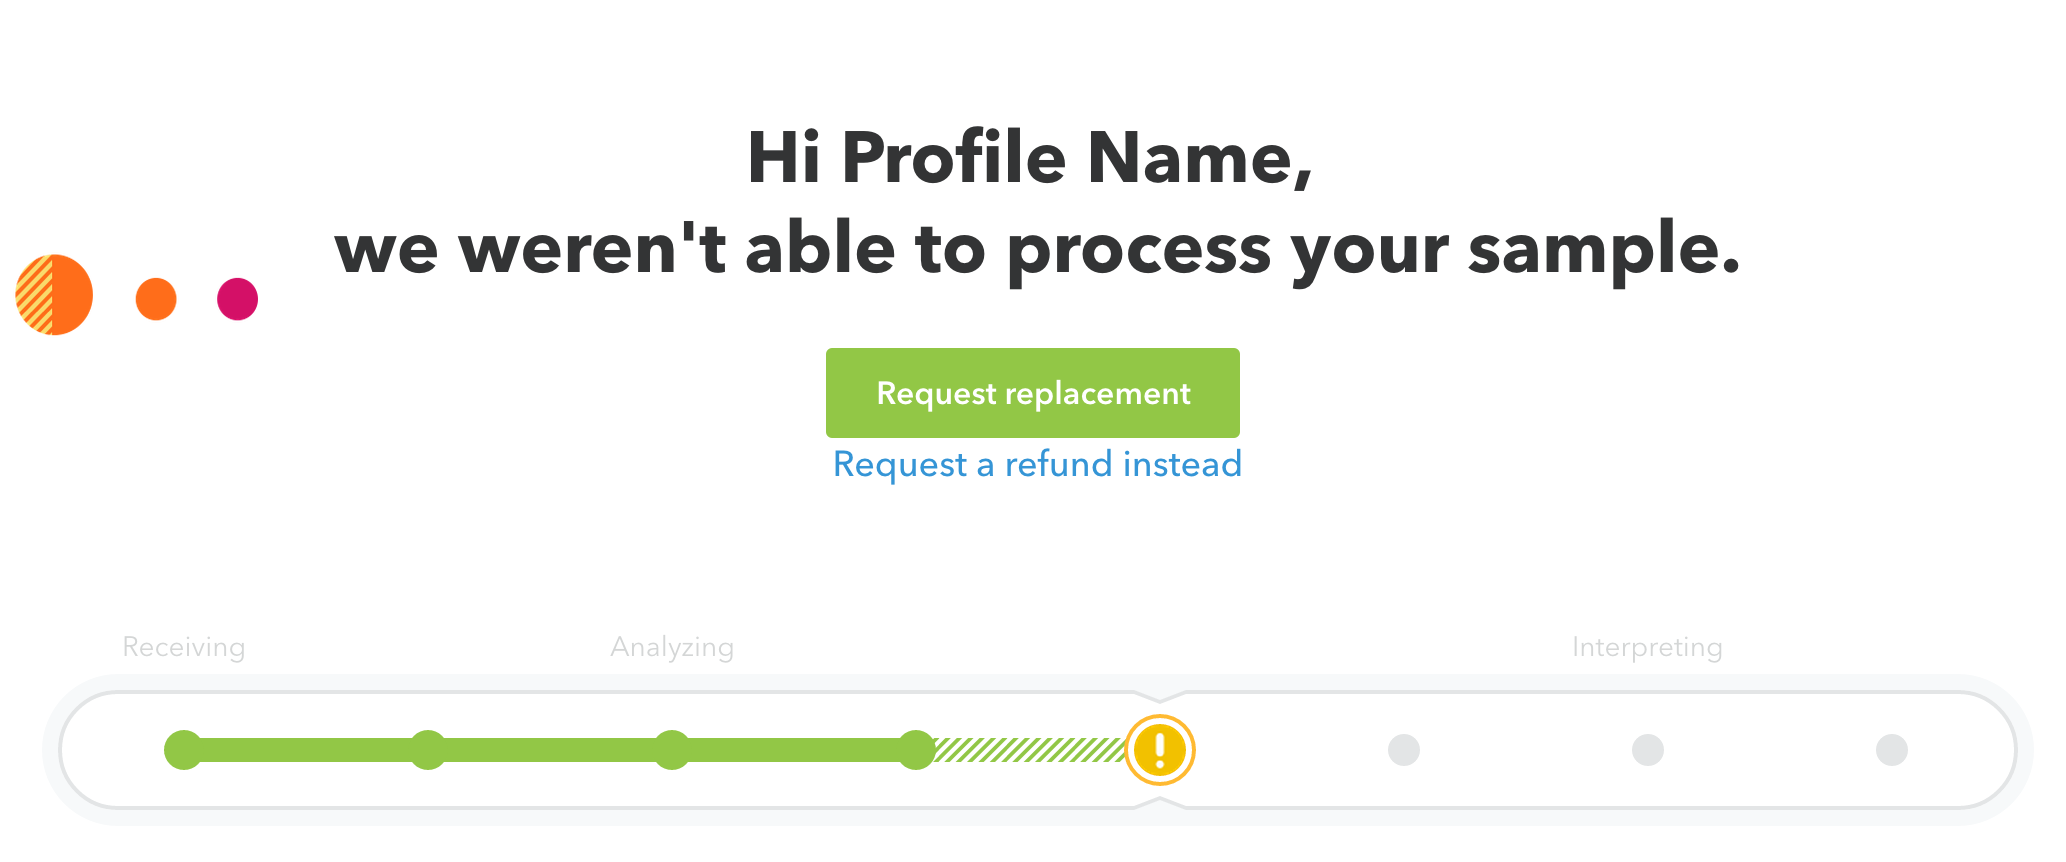 Why do some samples fail analysis 23andMe Customer Care – Sample Analysis